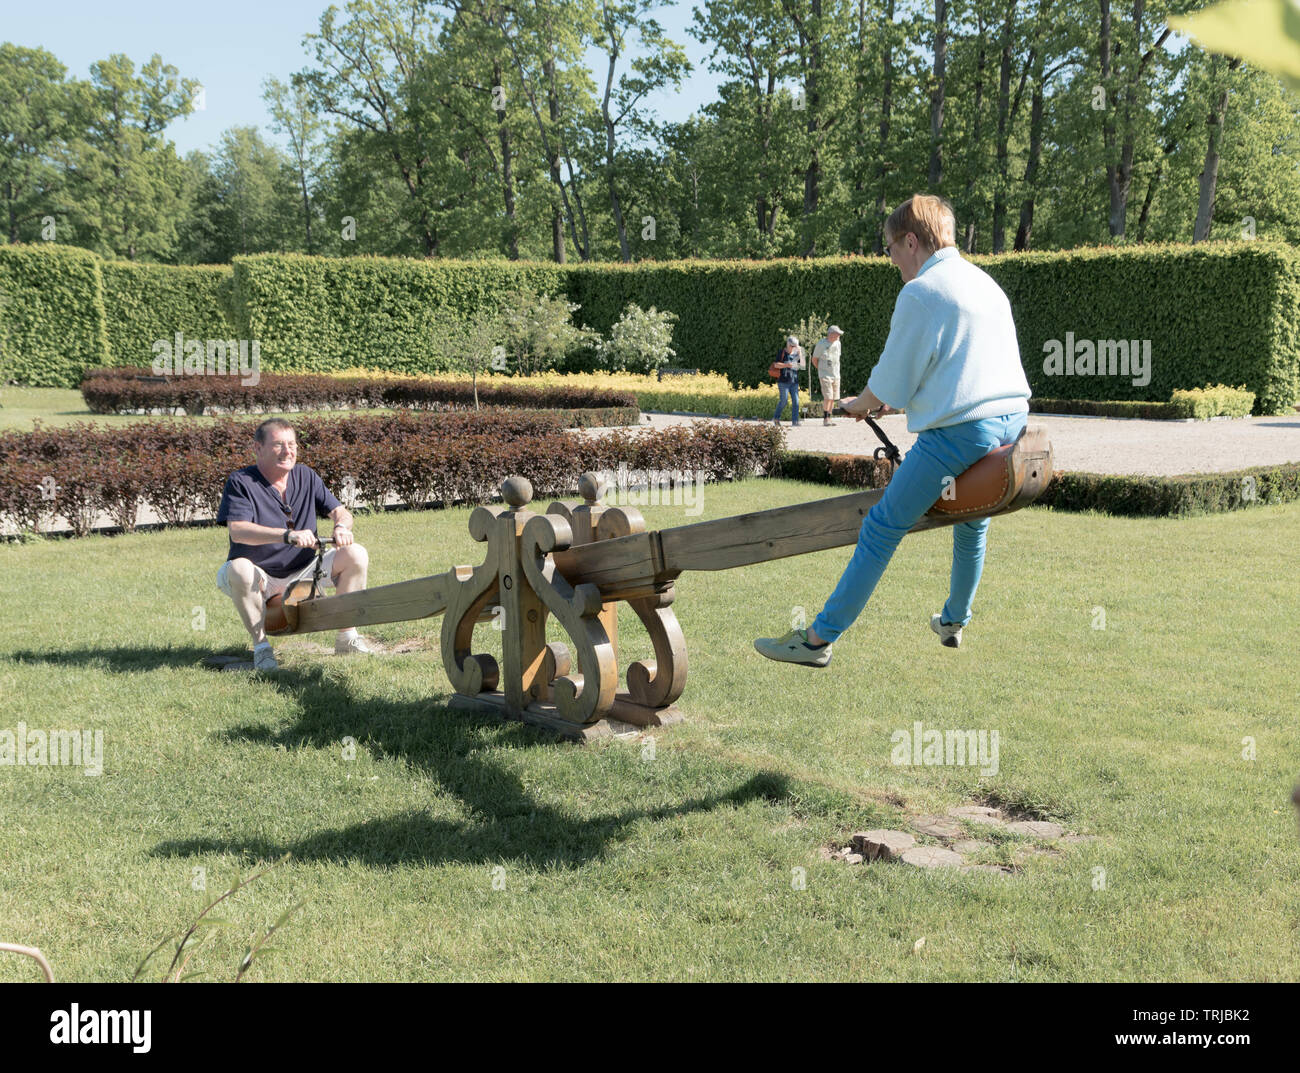 Seniors swinging on seesaw, Latvia - Stock Image